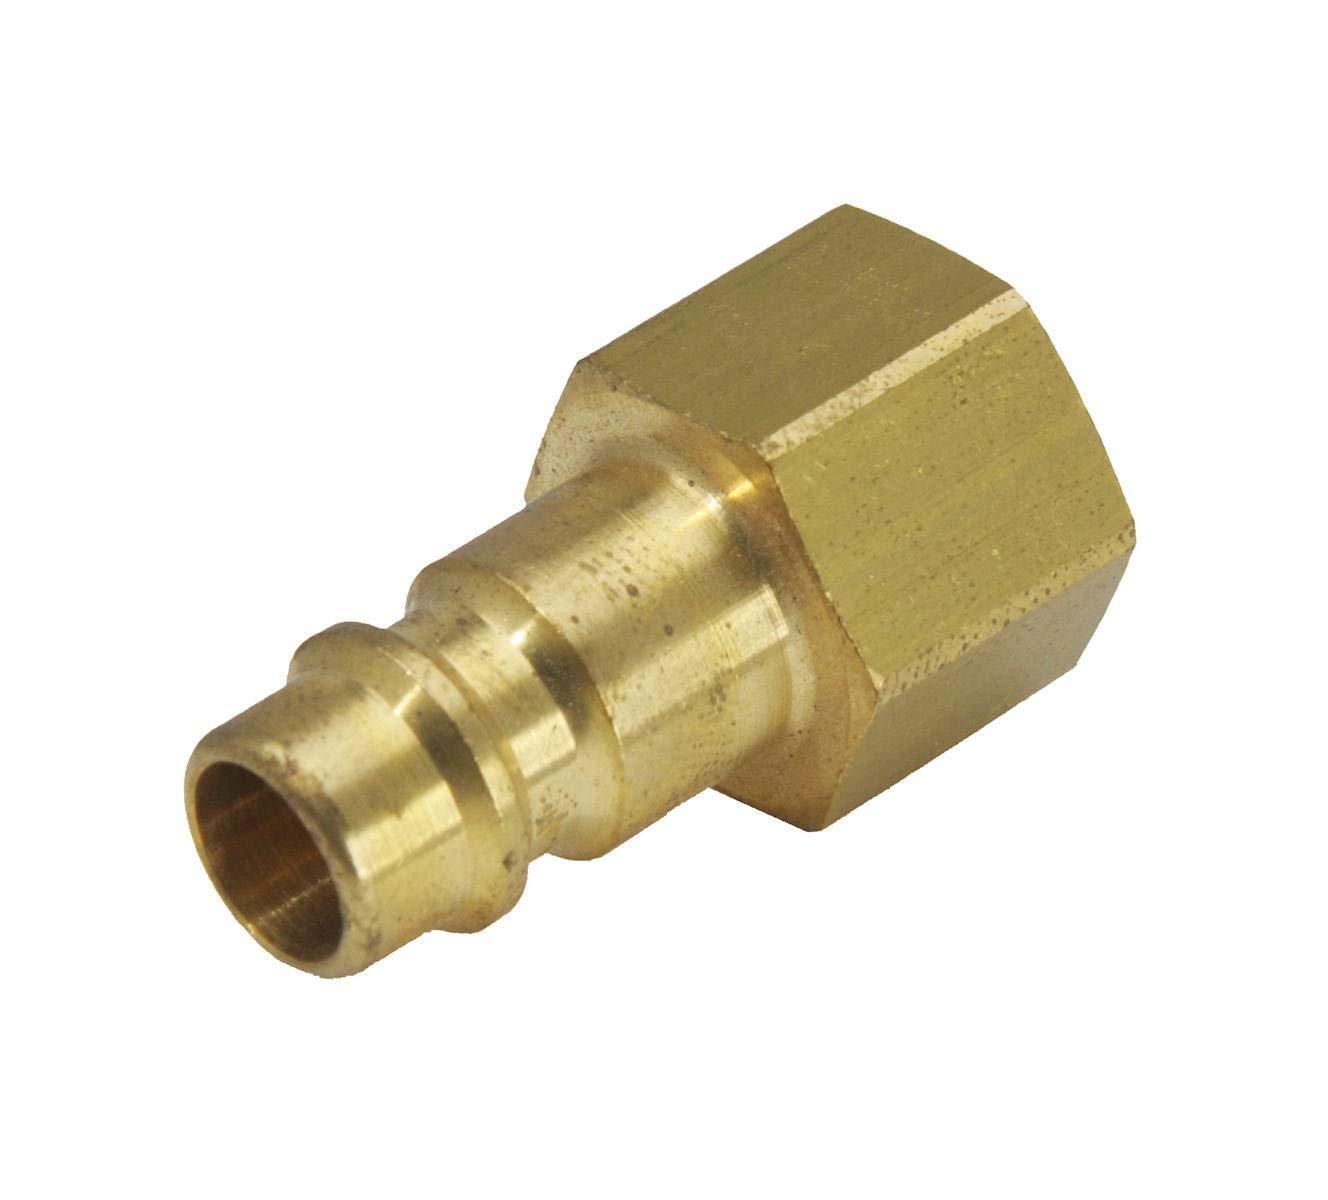 Kupplungsstecker NW7,2 Innengewinde G 3//8 Material Messing